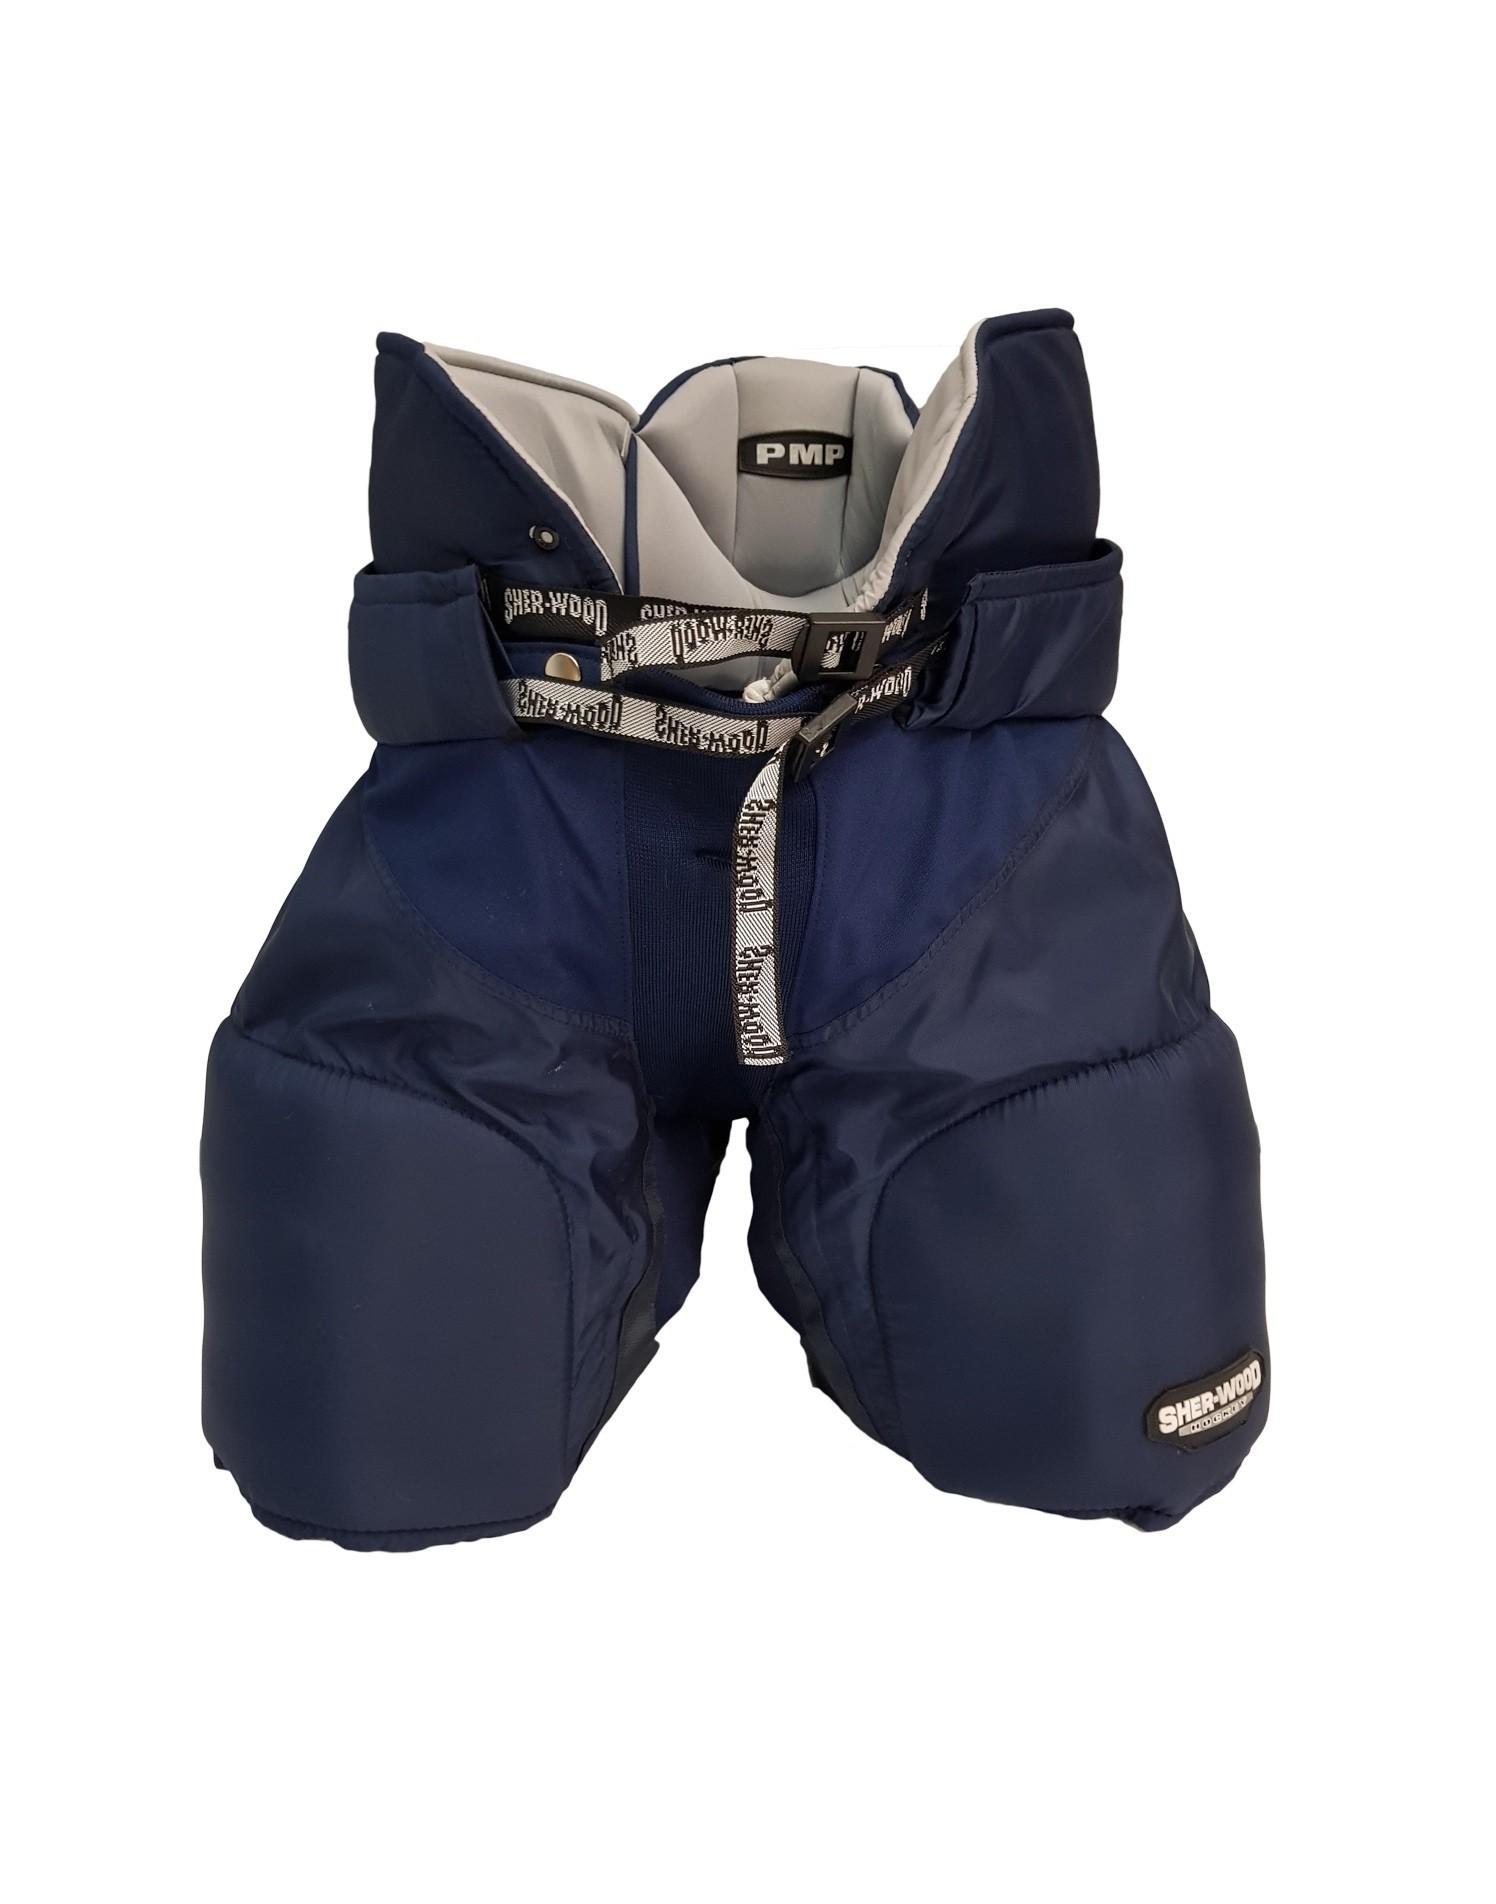 SHERWOOD PMPX6 Junior Ice Hockey Pants